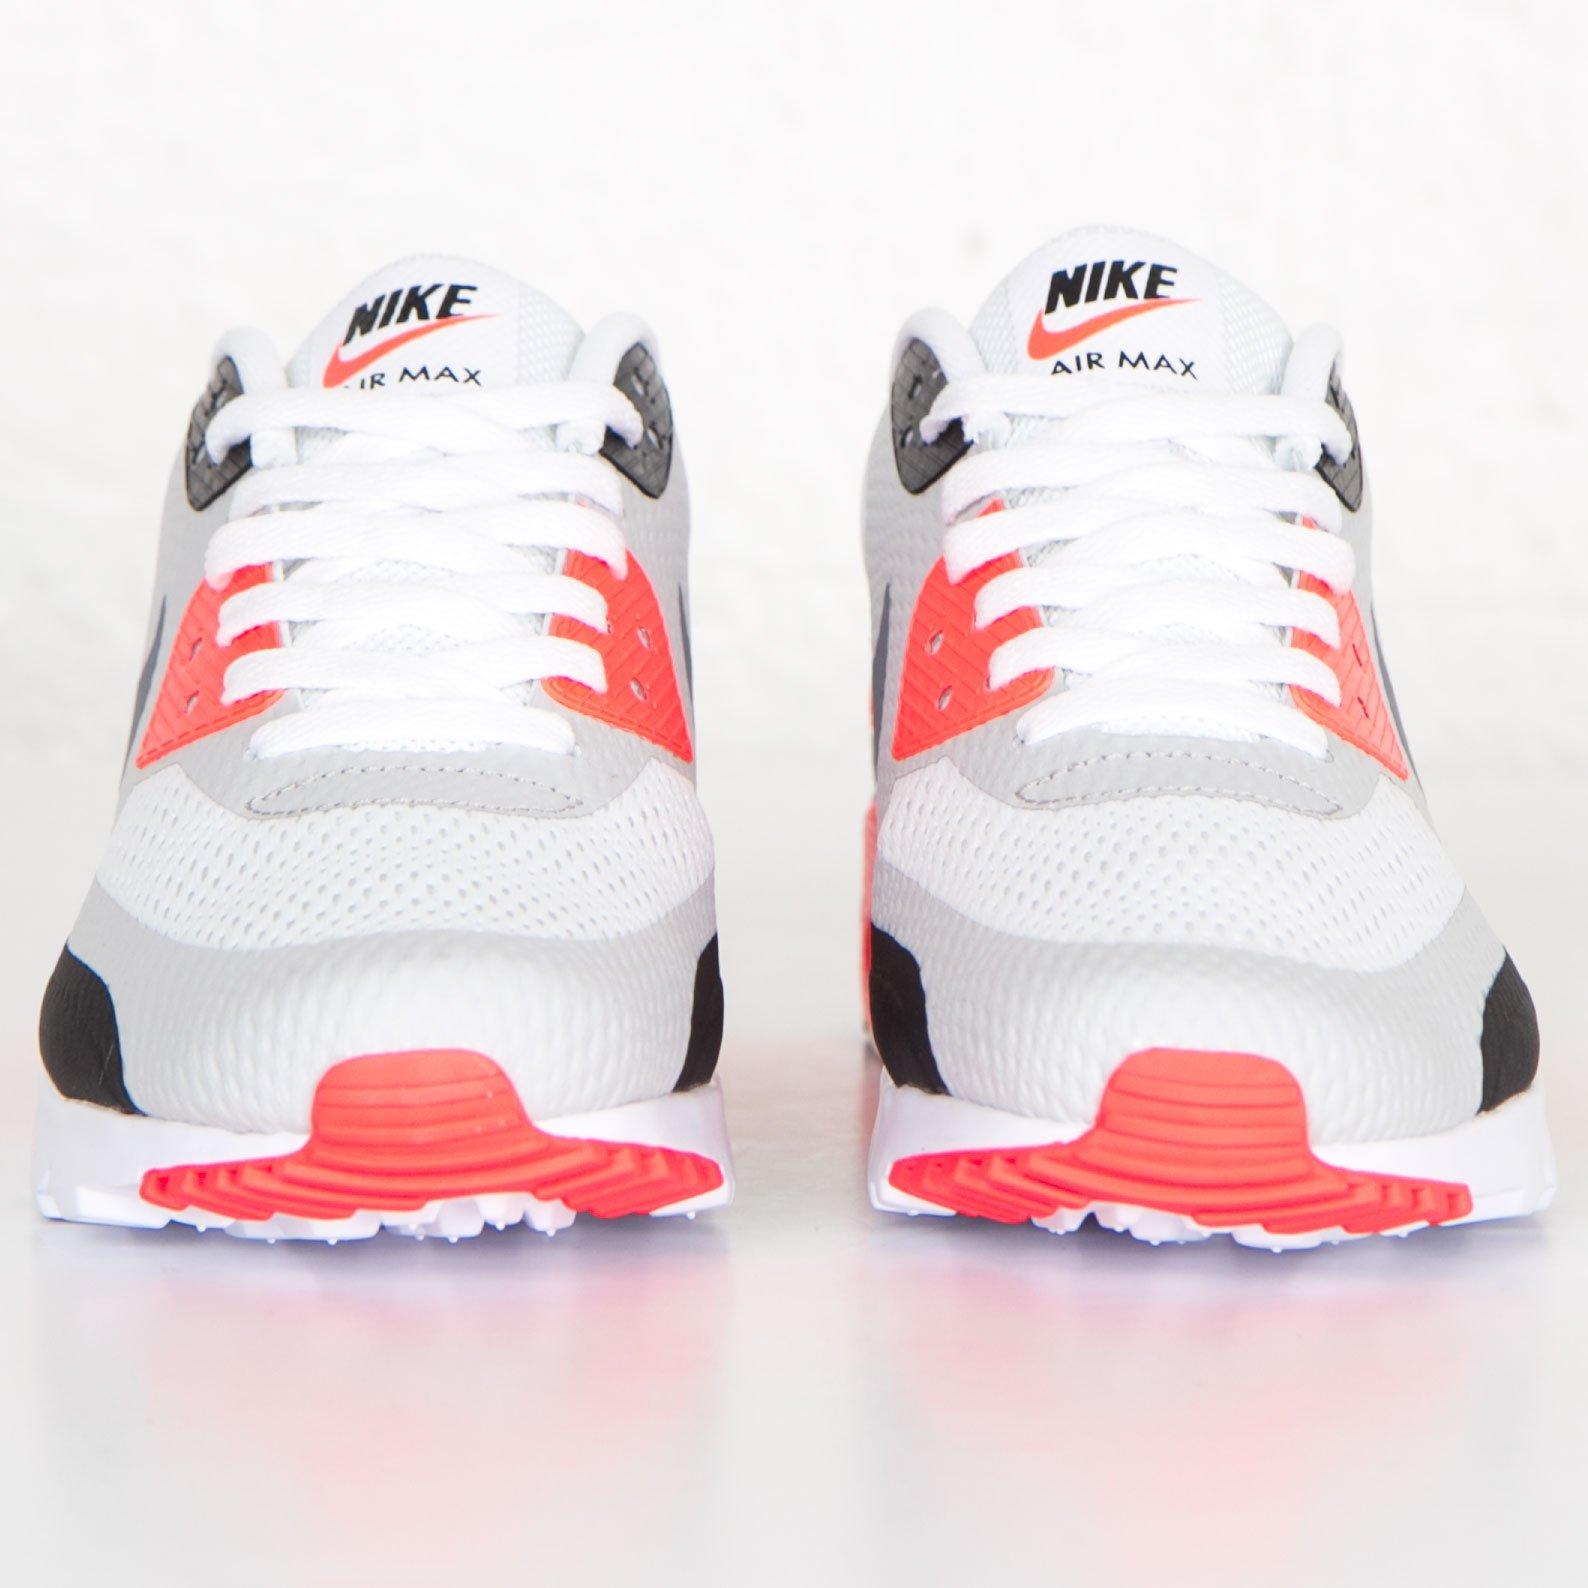 Nike Air Max 90 Ultra Essential Infrared aktion